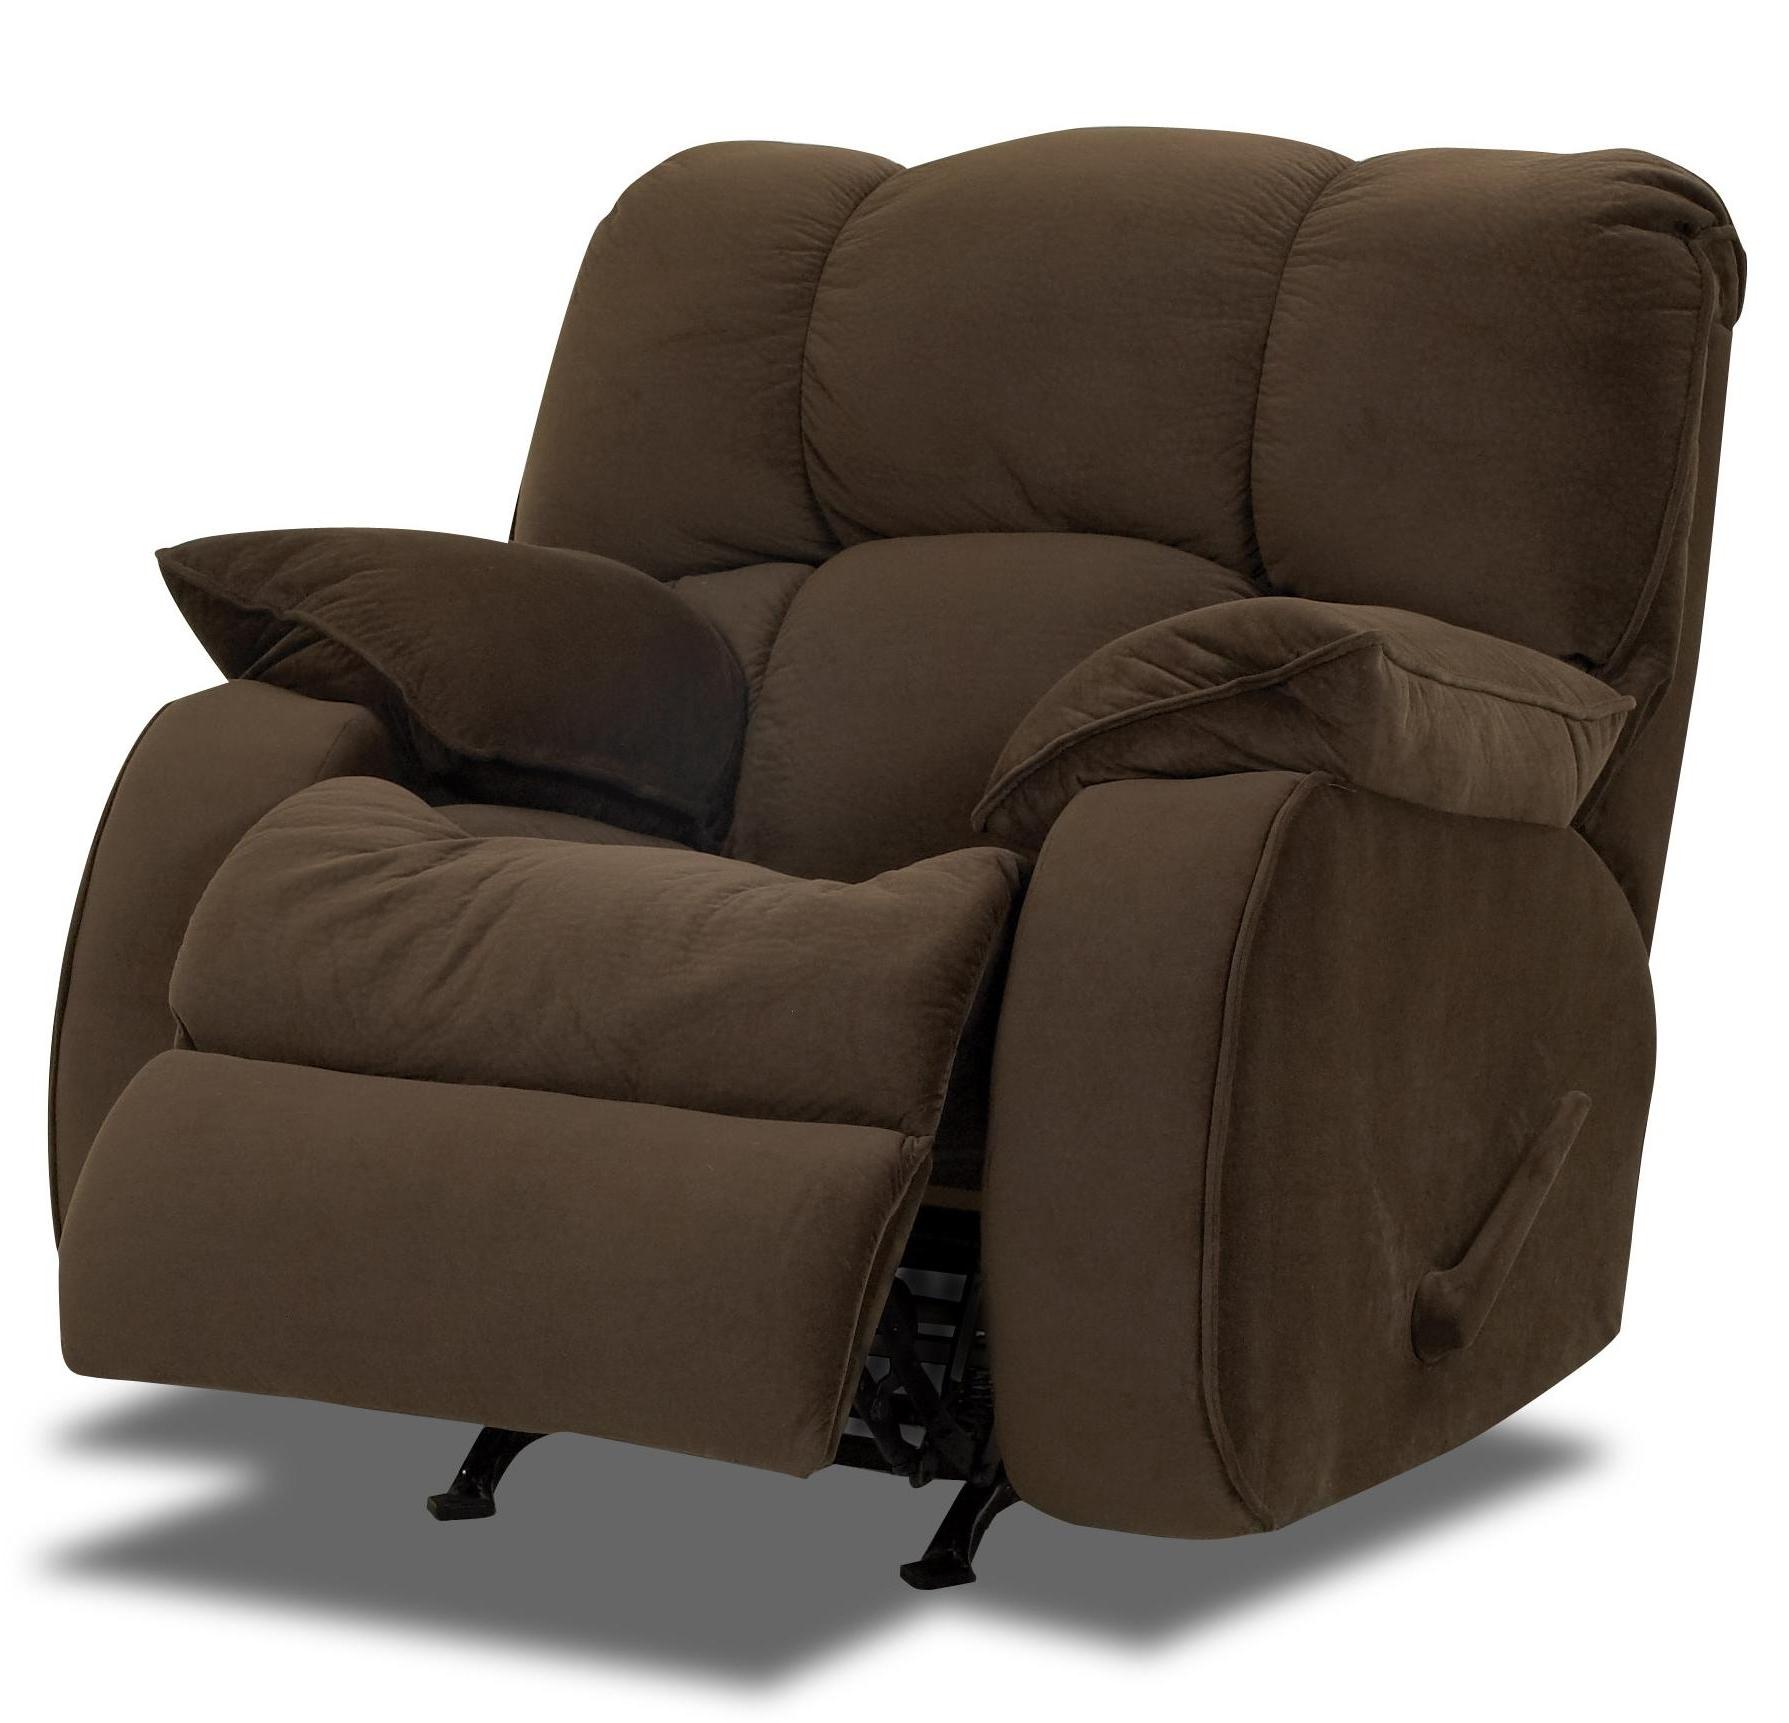 Rocking Sofa Chairs